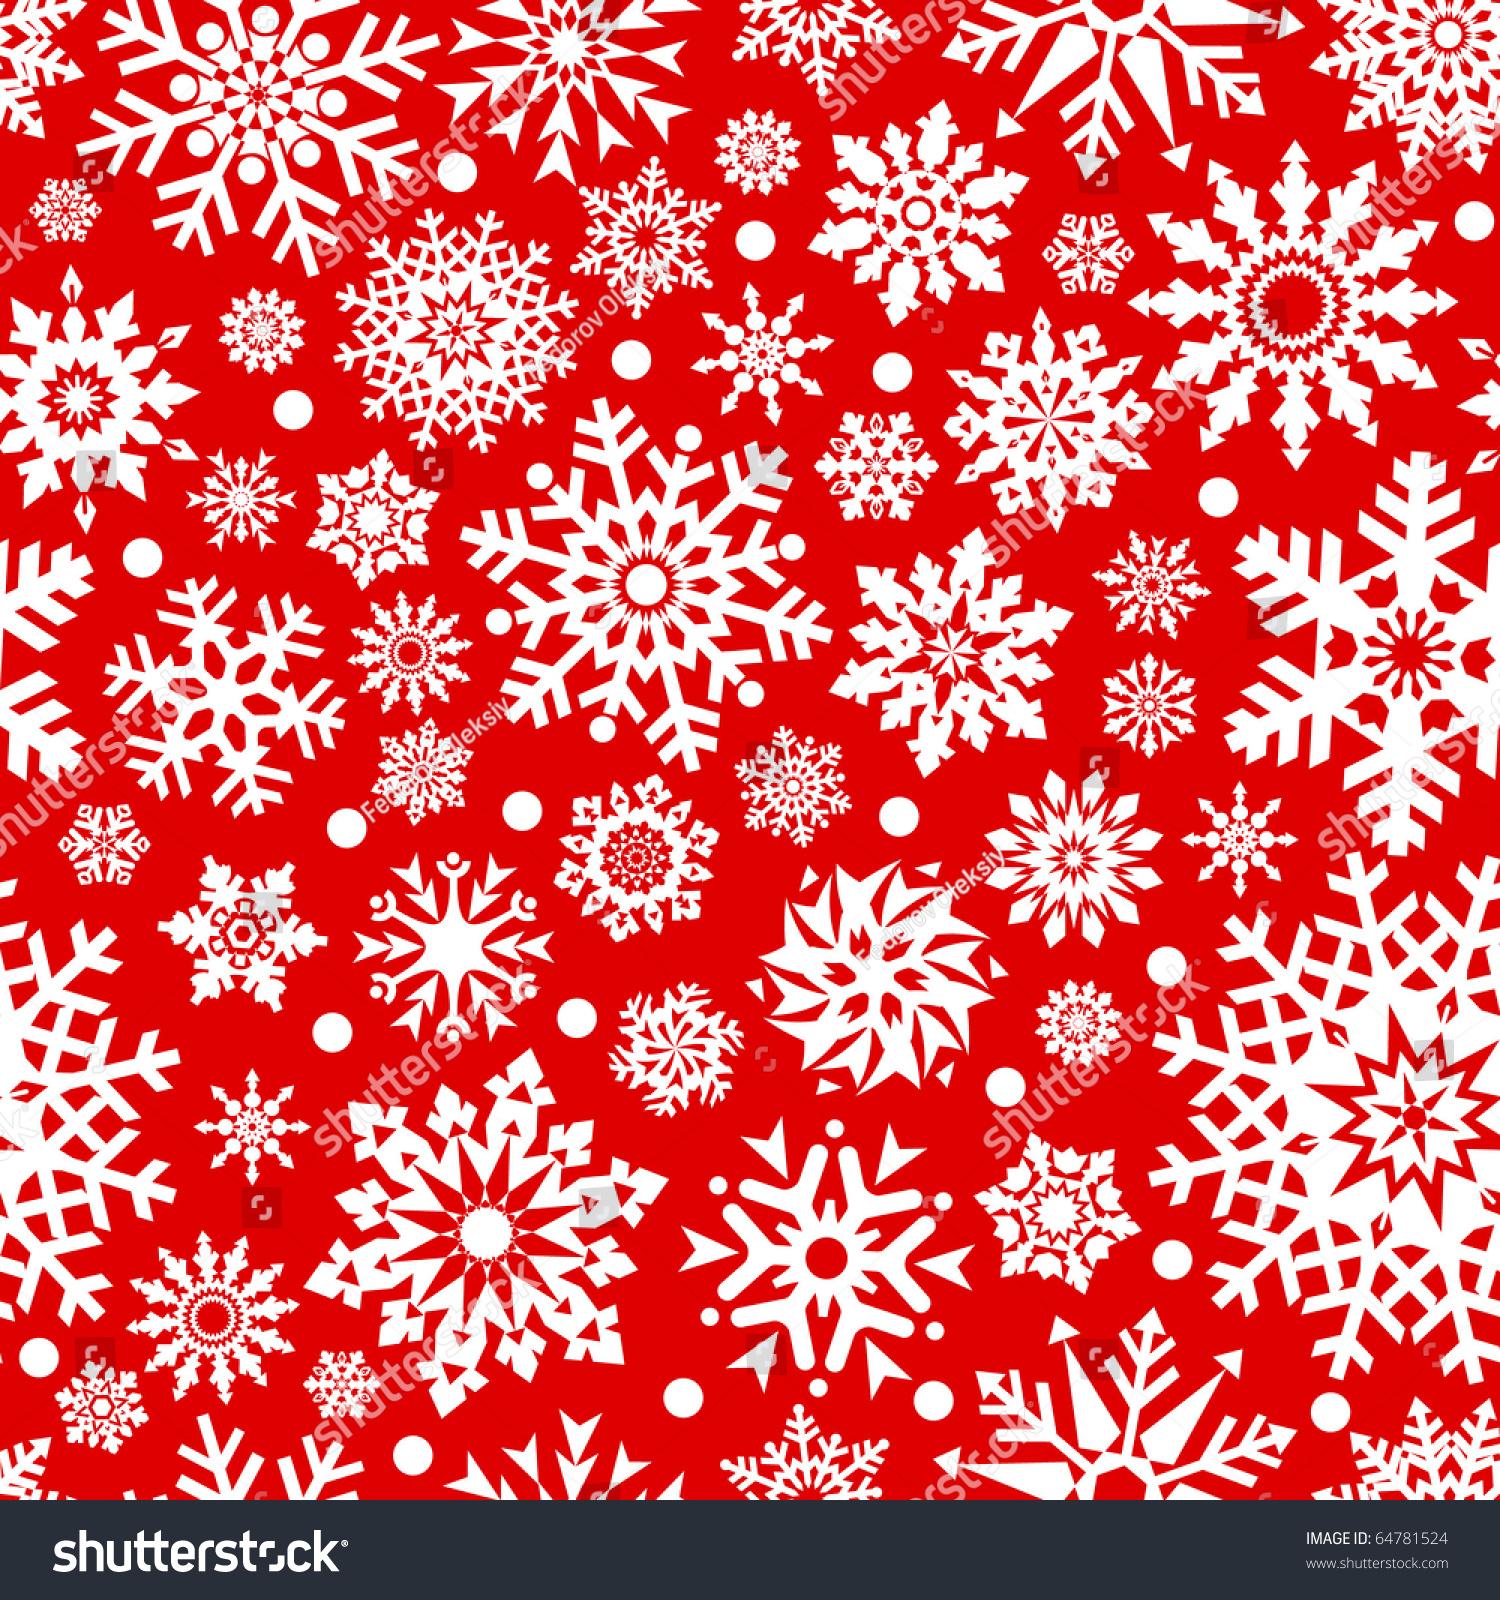 Bokeh Snowflake Background PSD - Free Photoshop Brushes at ... |White Snowflake Wallpaper